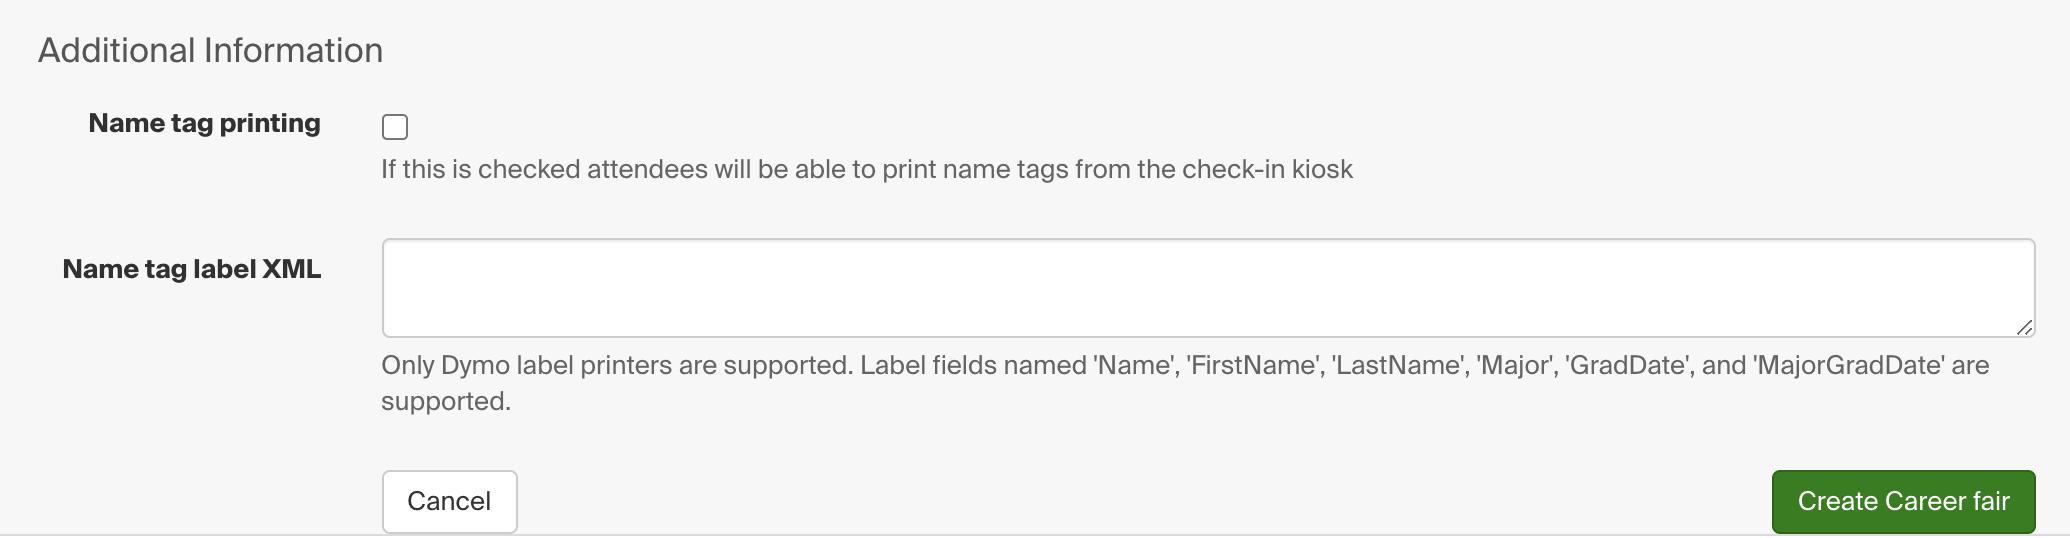 name_tag_printing.png